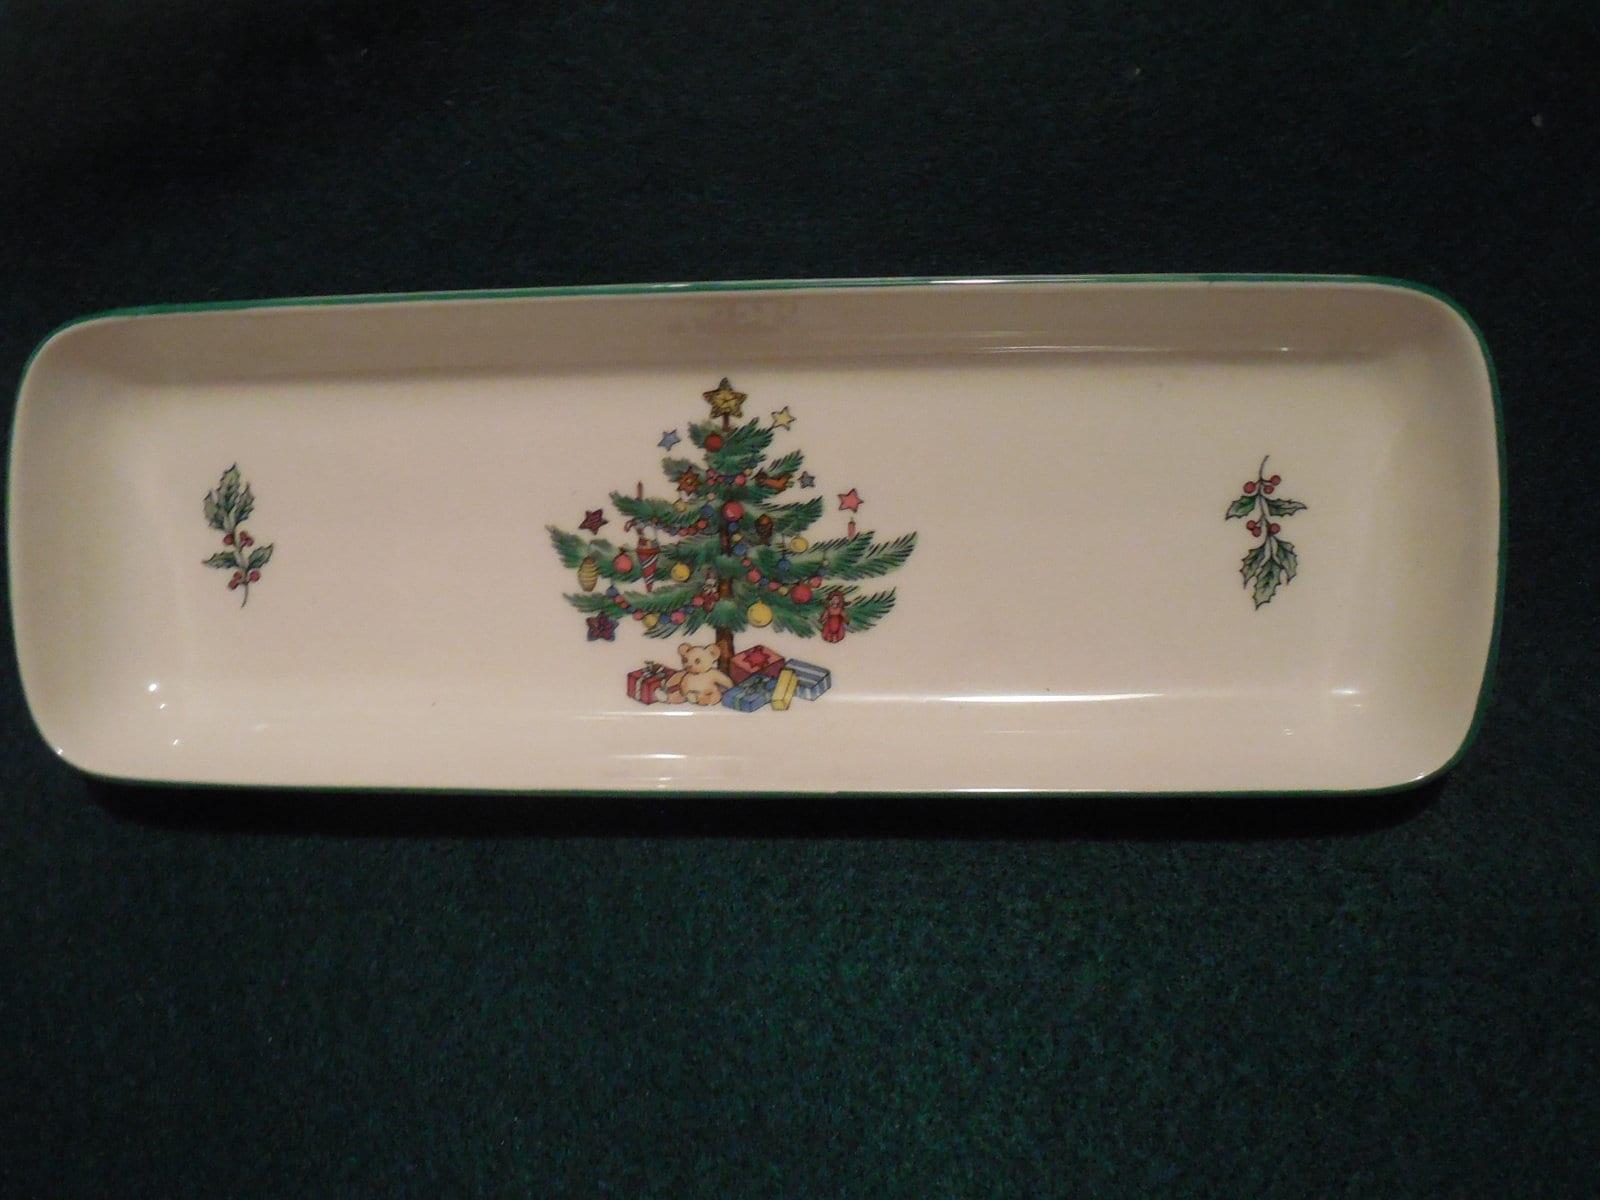 Nikko Christmas dish for candies / treats / decor Nikko China | Etsy